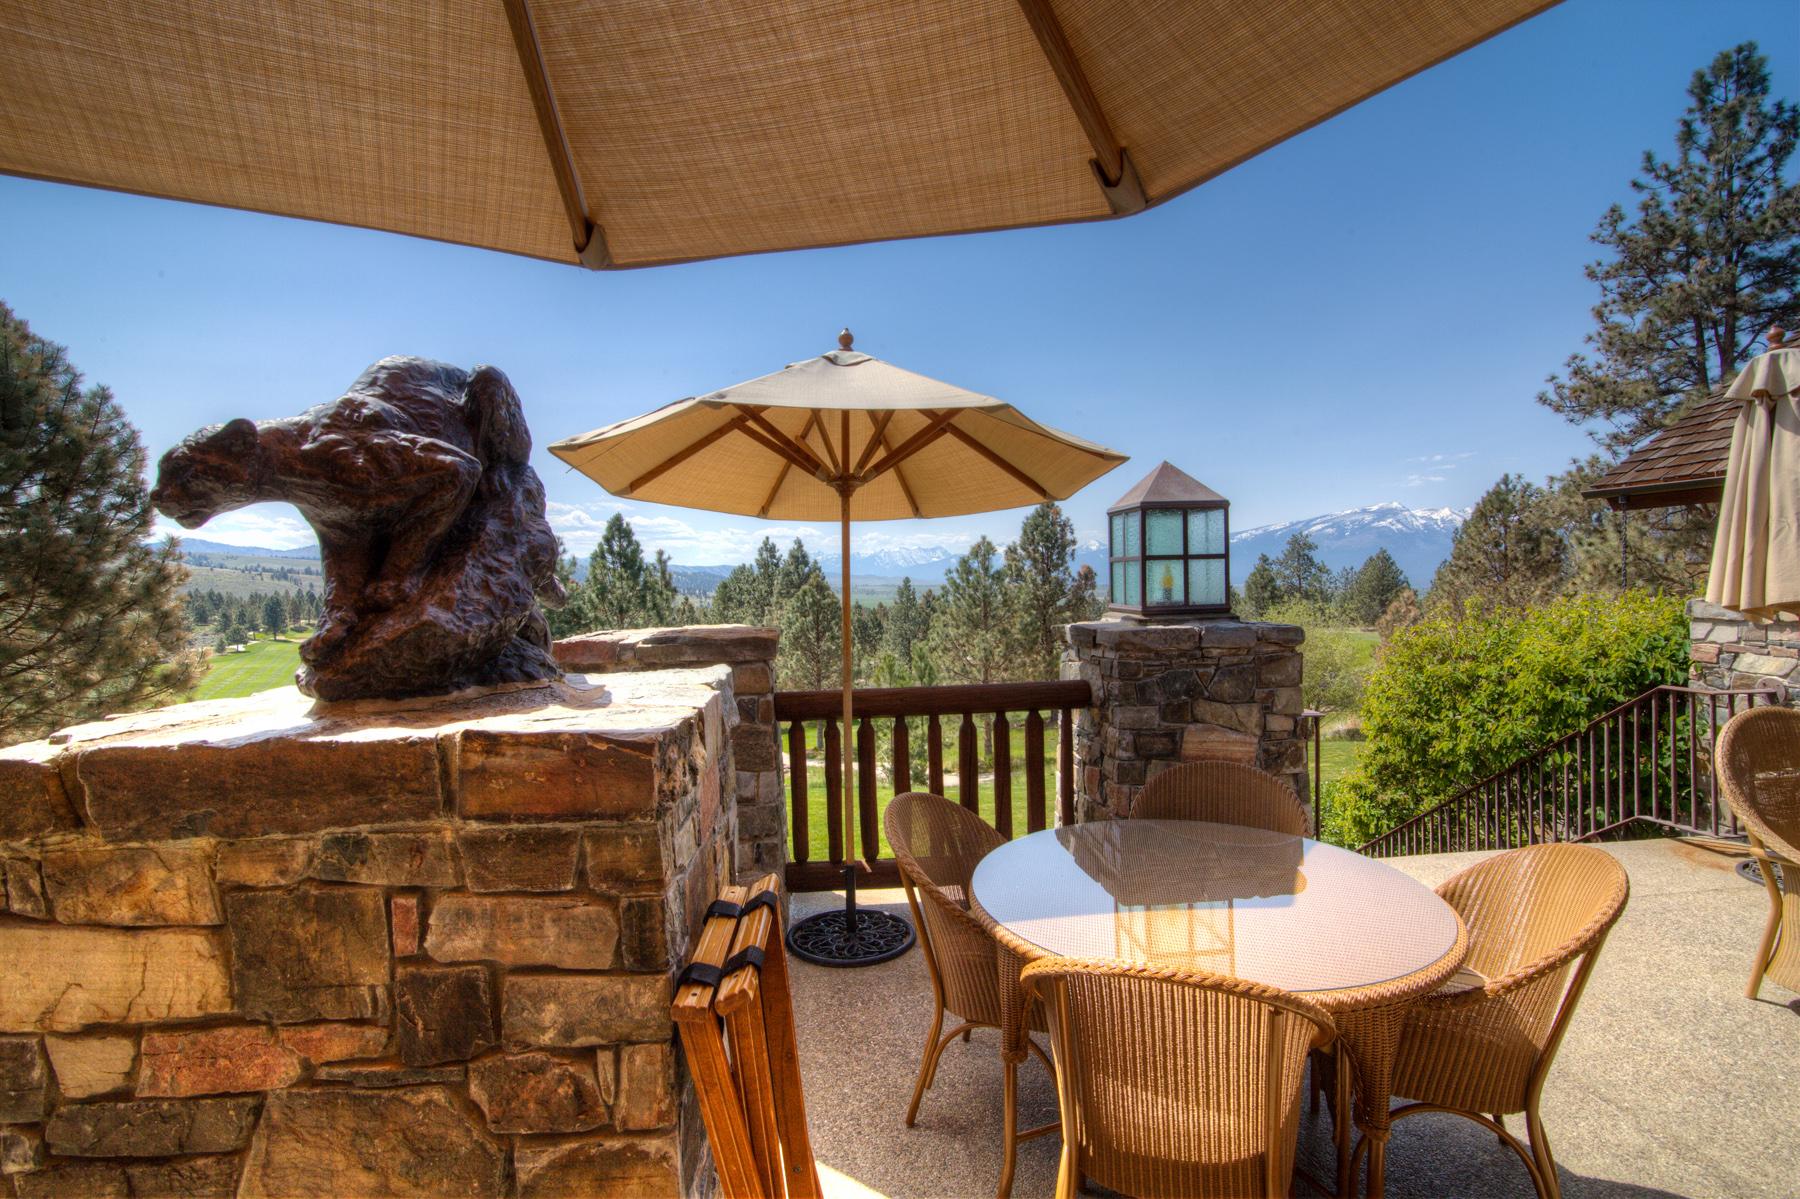 Additional photo for property listing at Lot 52 Stock Farm Lot 52  Stock Farm Rd Hamilton, Montana 59840 United States